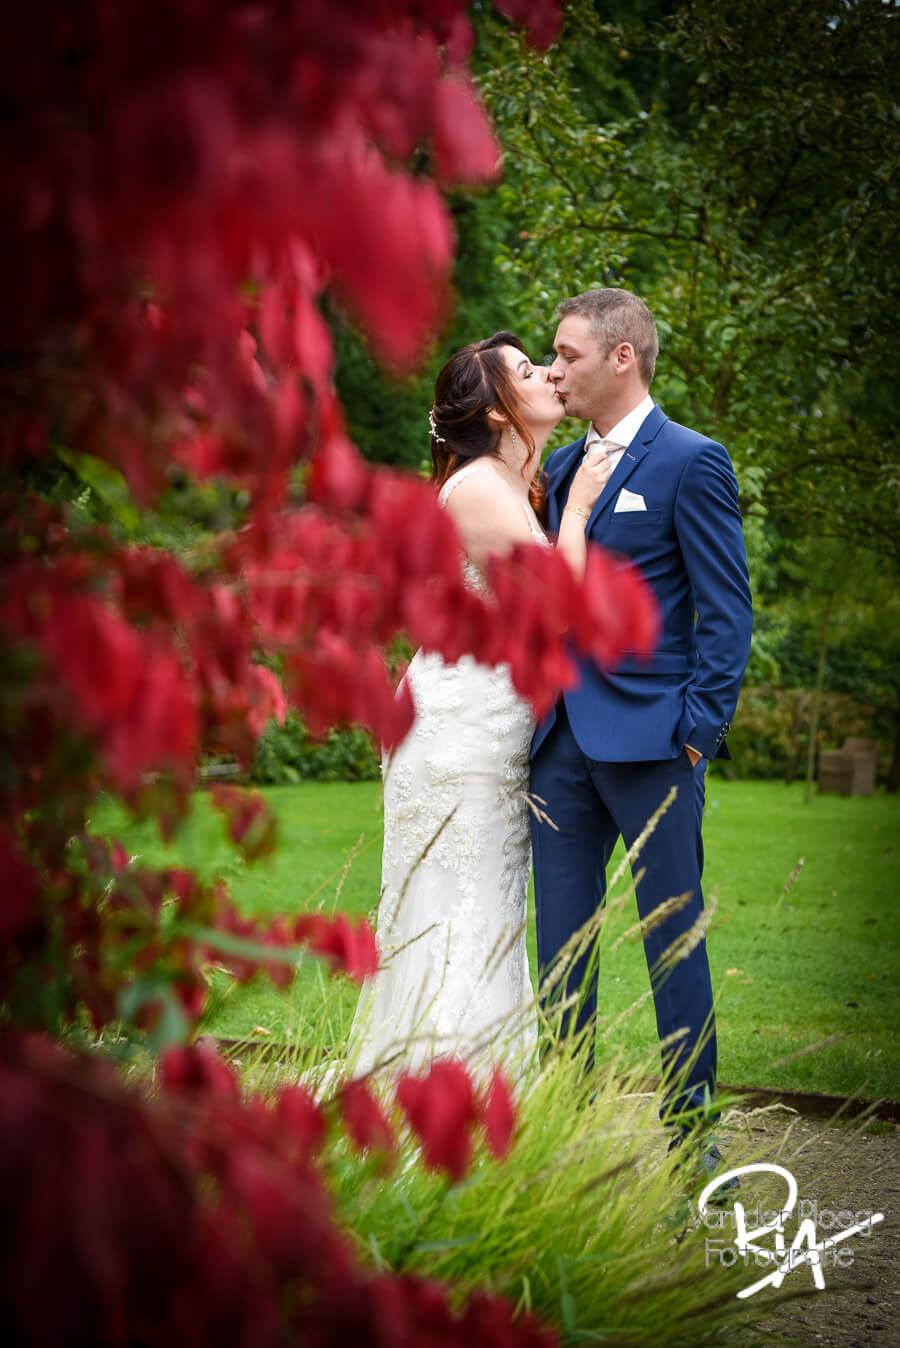 Bruidsreportage fotograaf Mierlo natuur